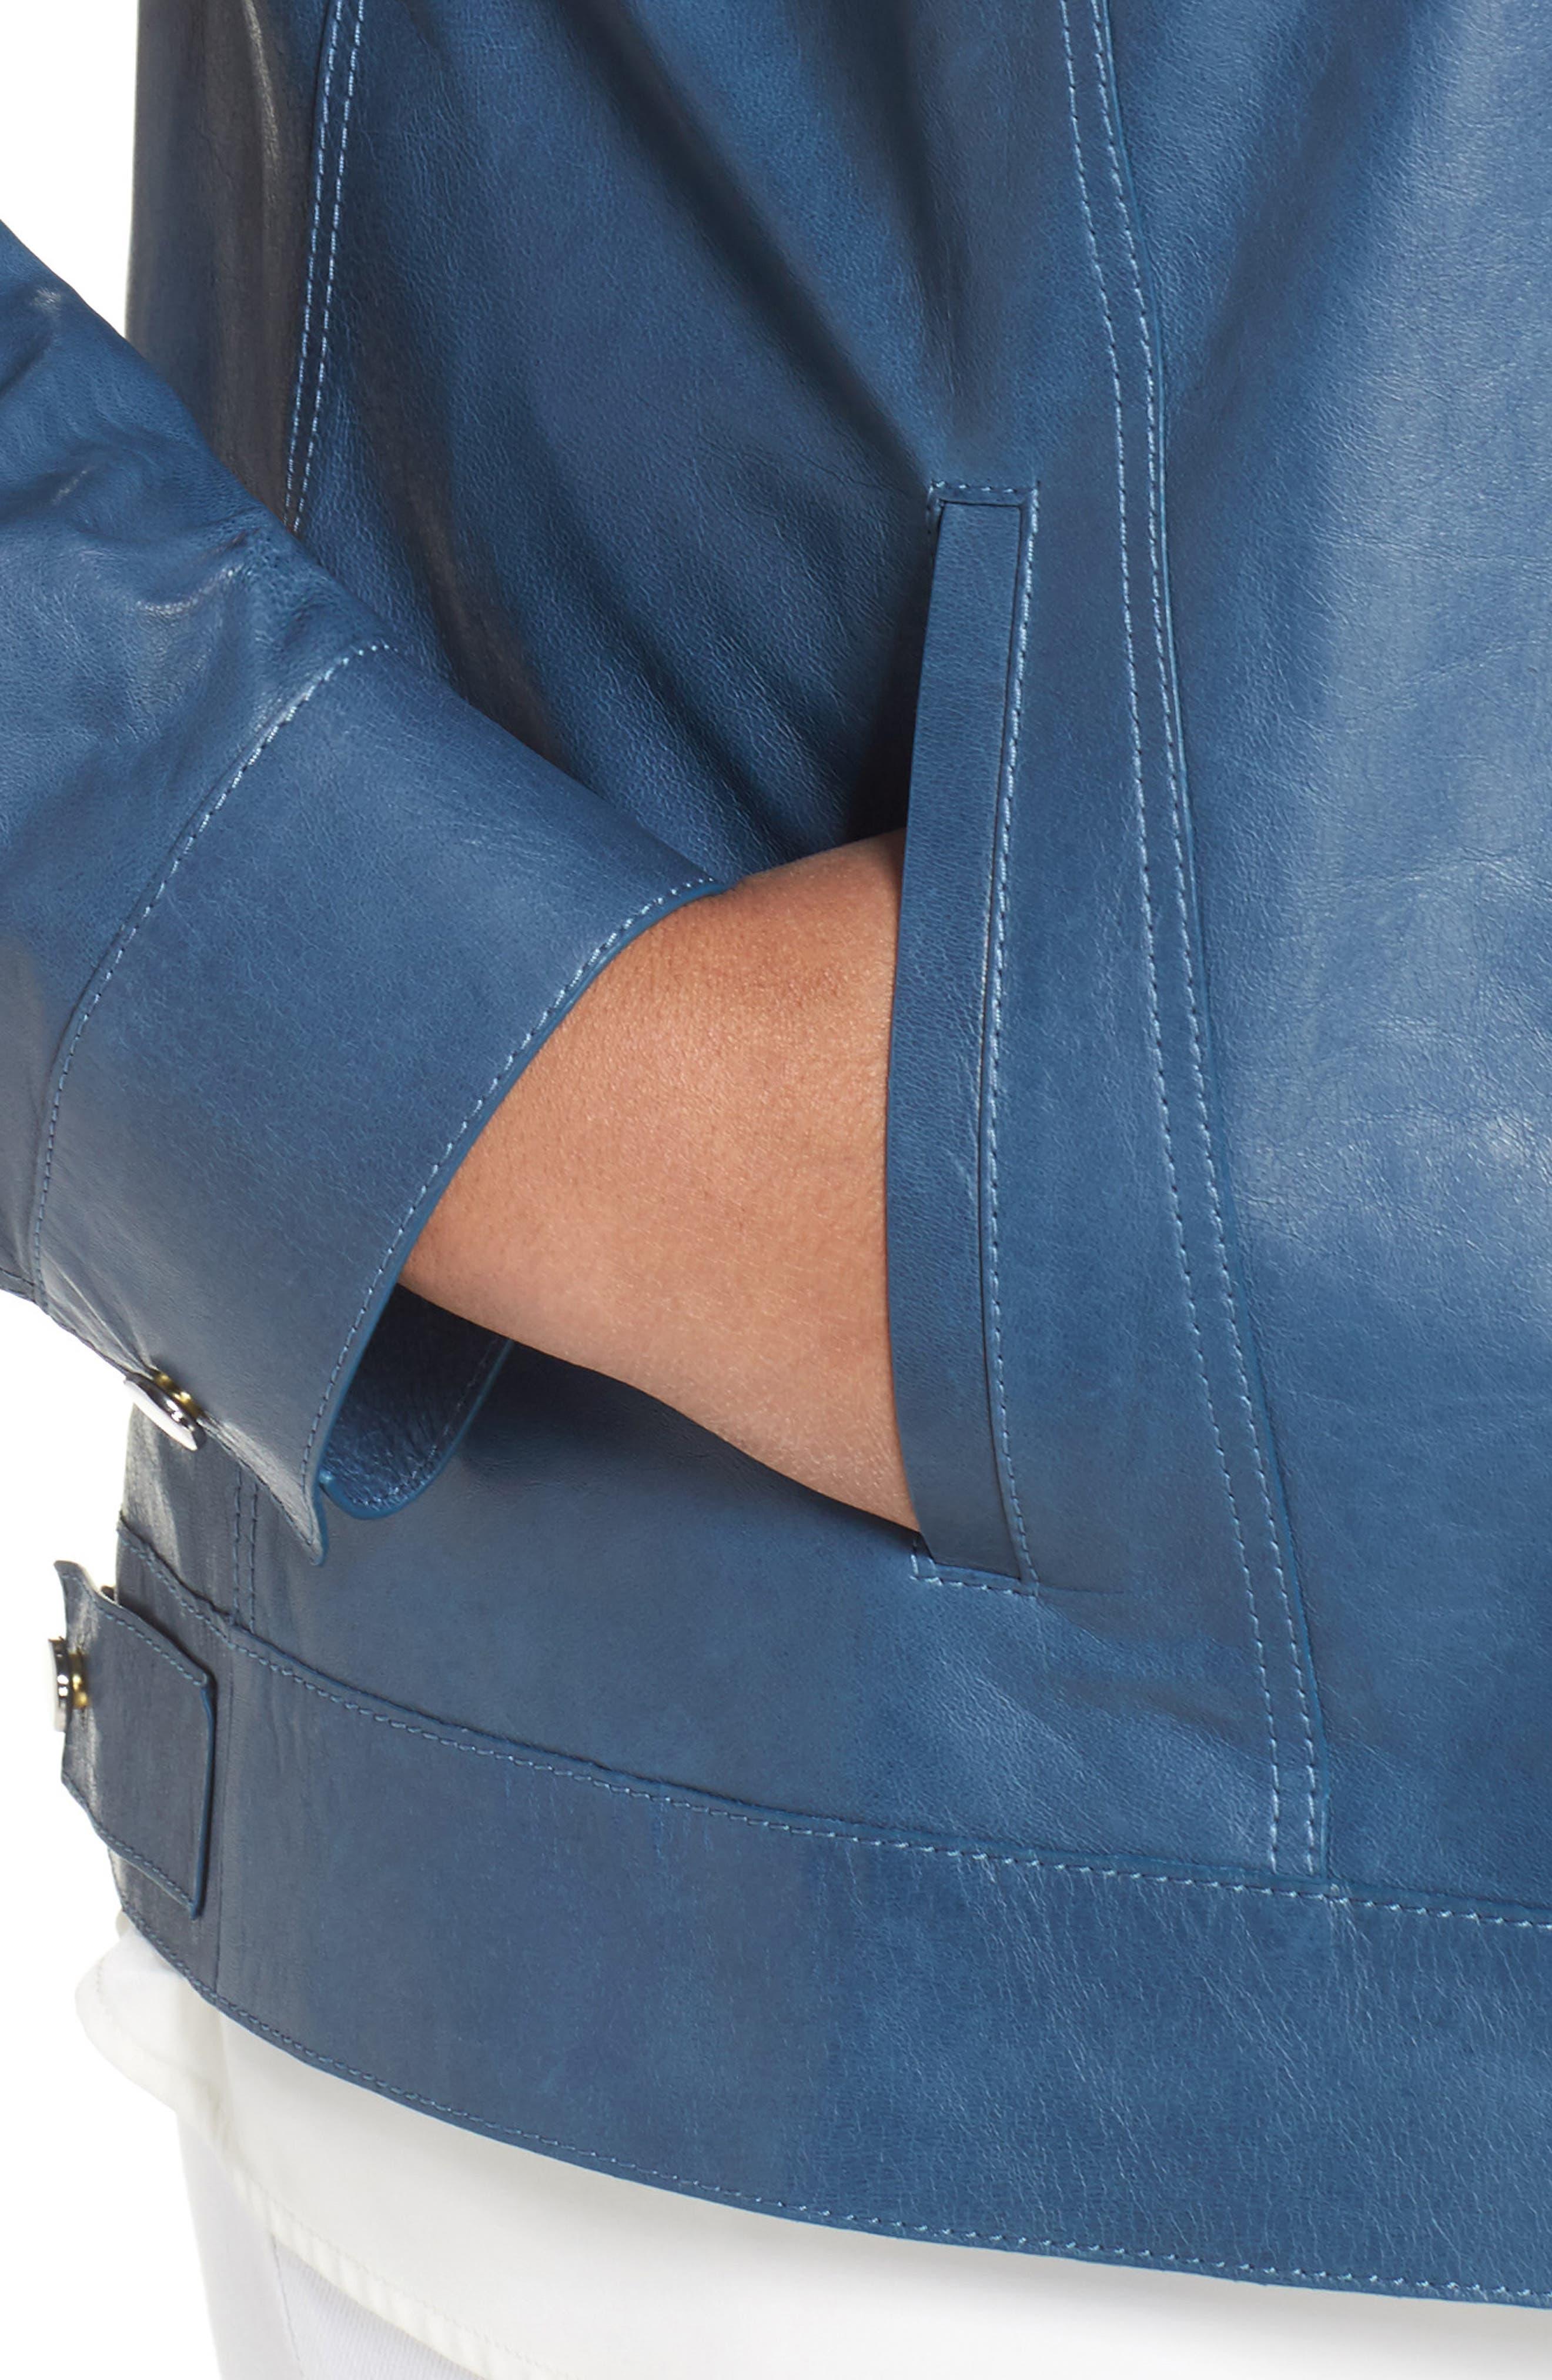 Destiny Leather Jacket,                             Alternate thumbnail 4, color,                             Placid Blue